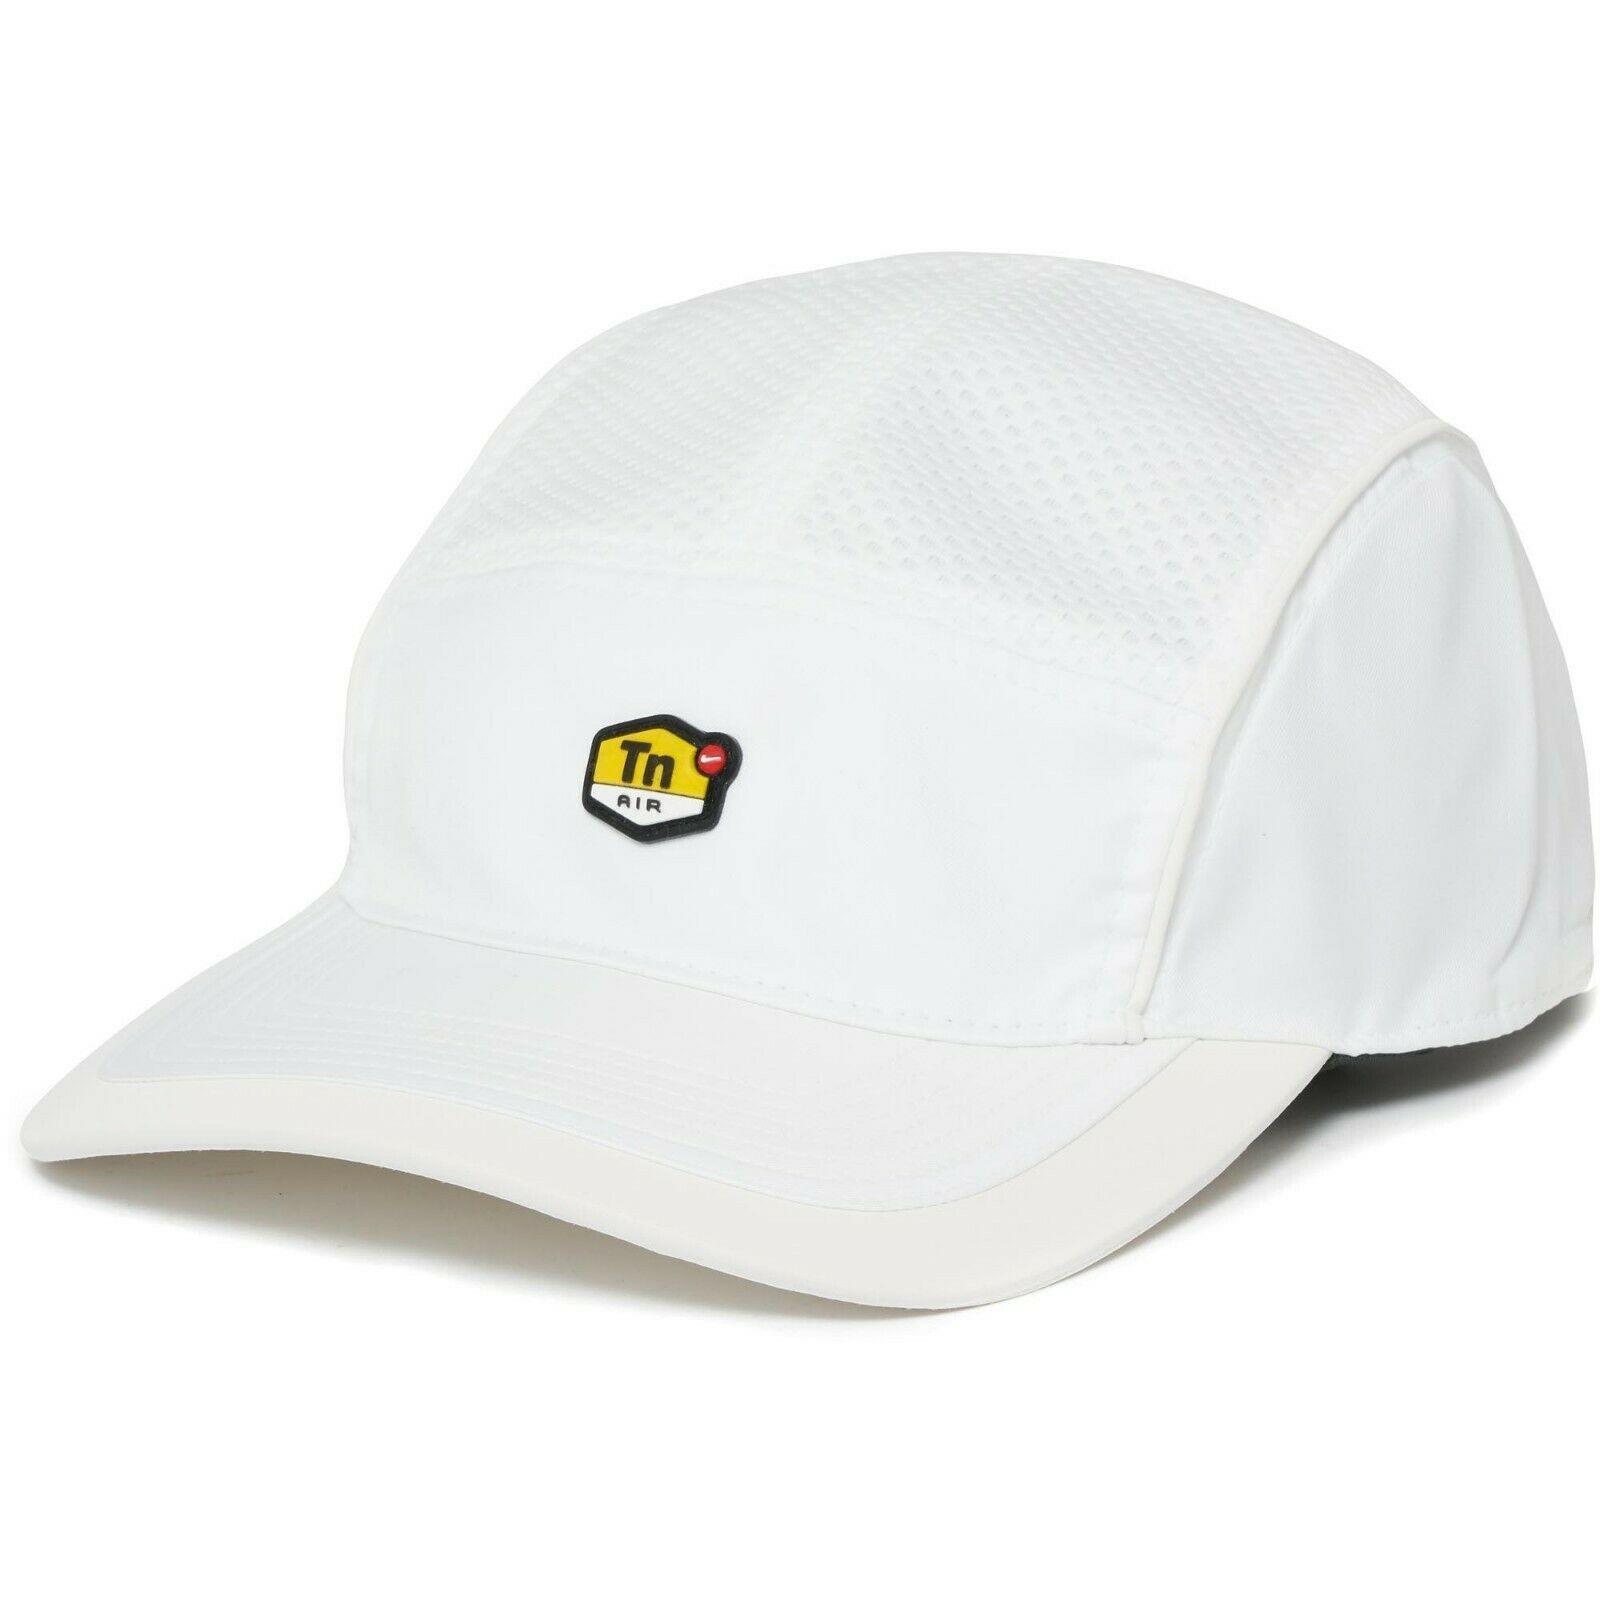 Nike Aerobill AW84 Reflective TN Running Cap Hat White 913012-100